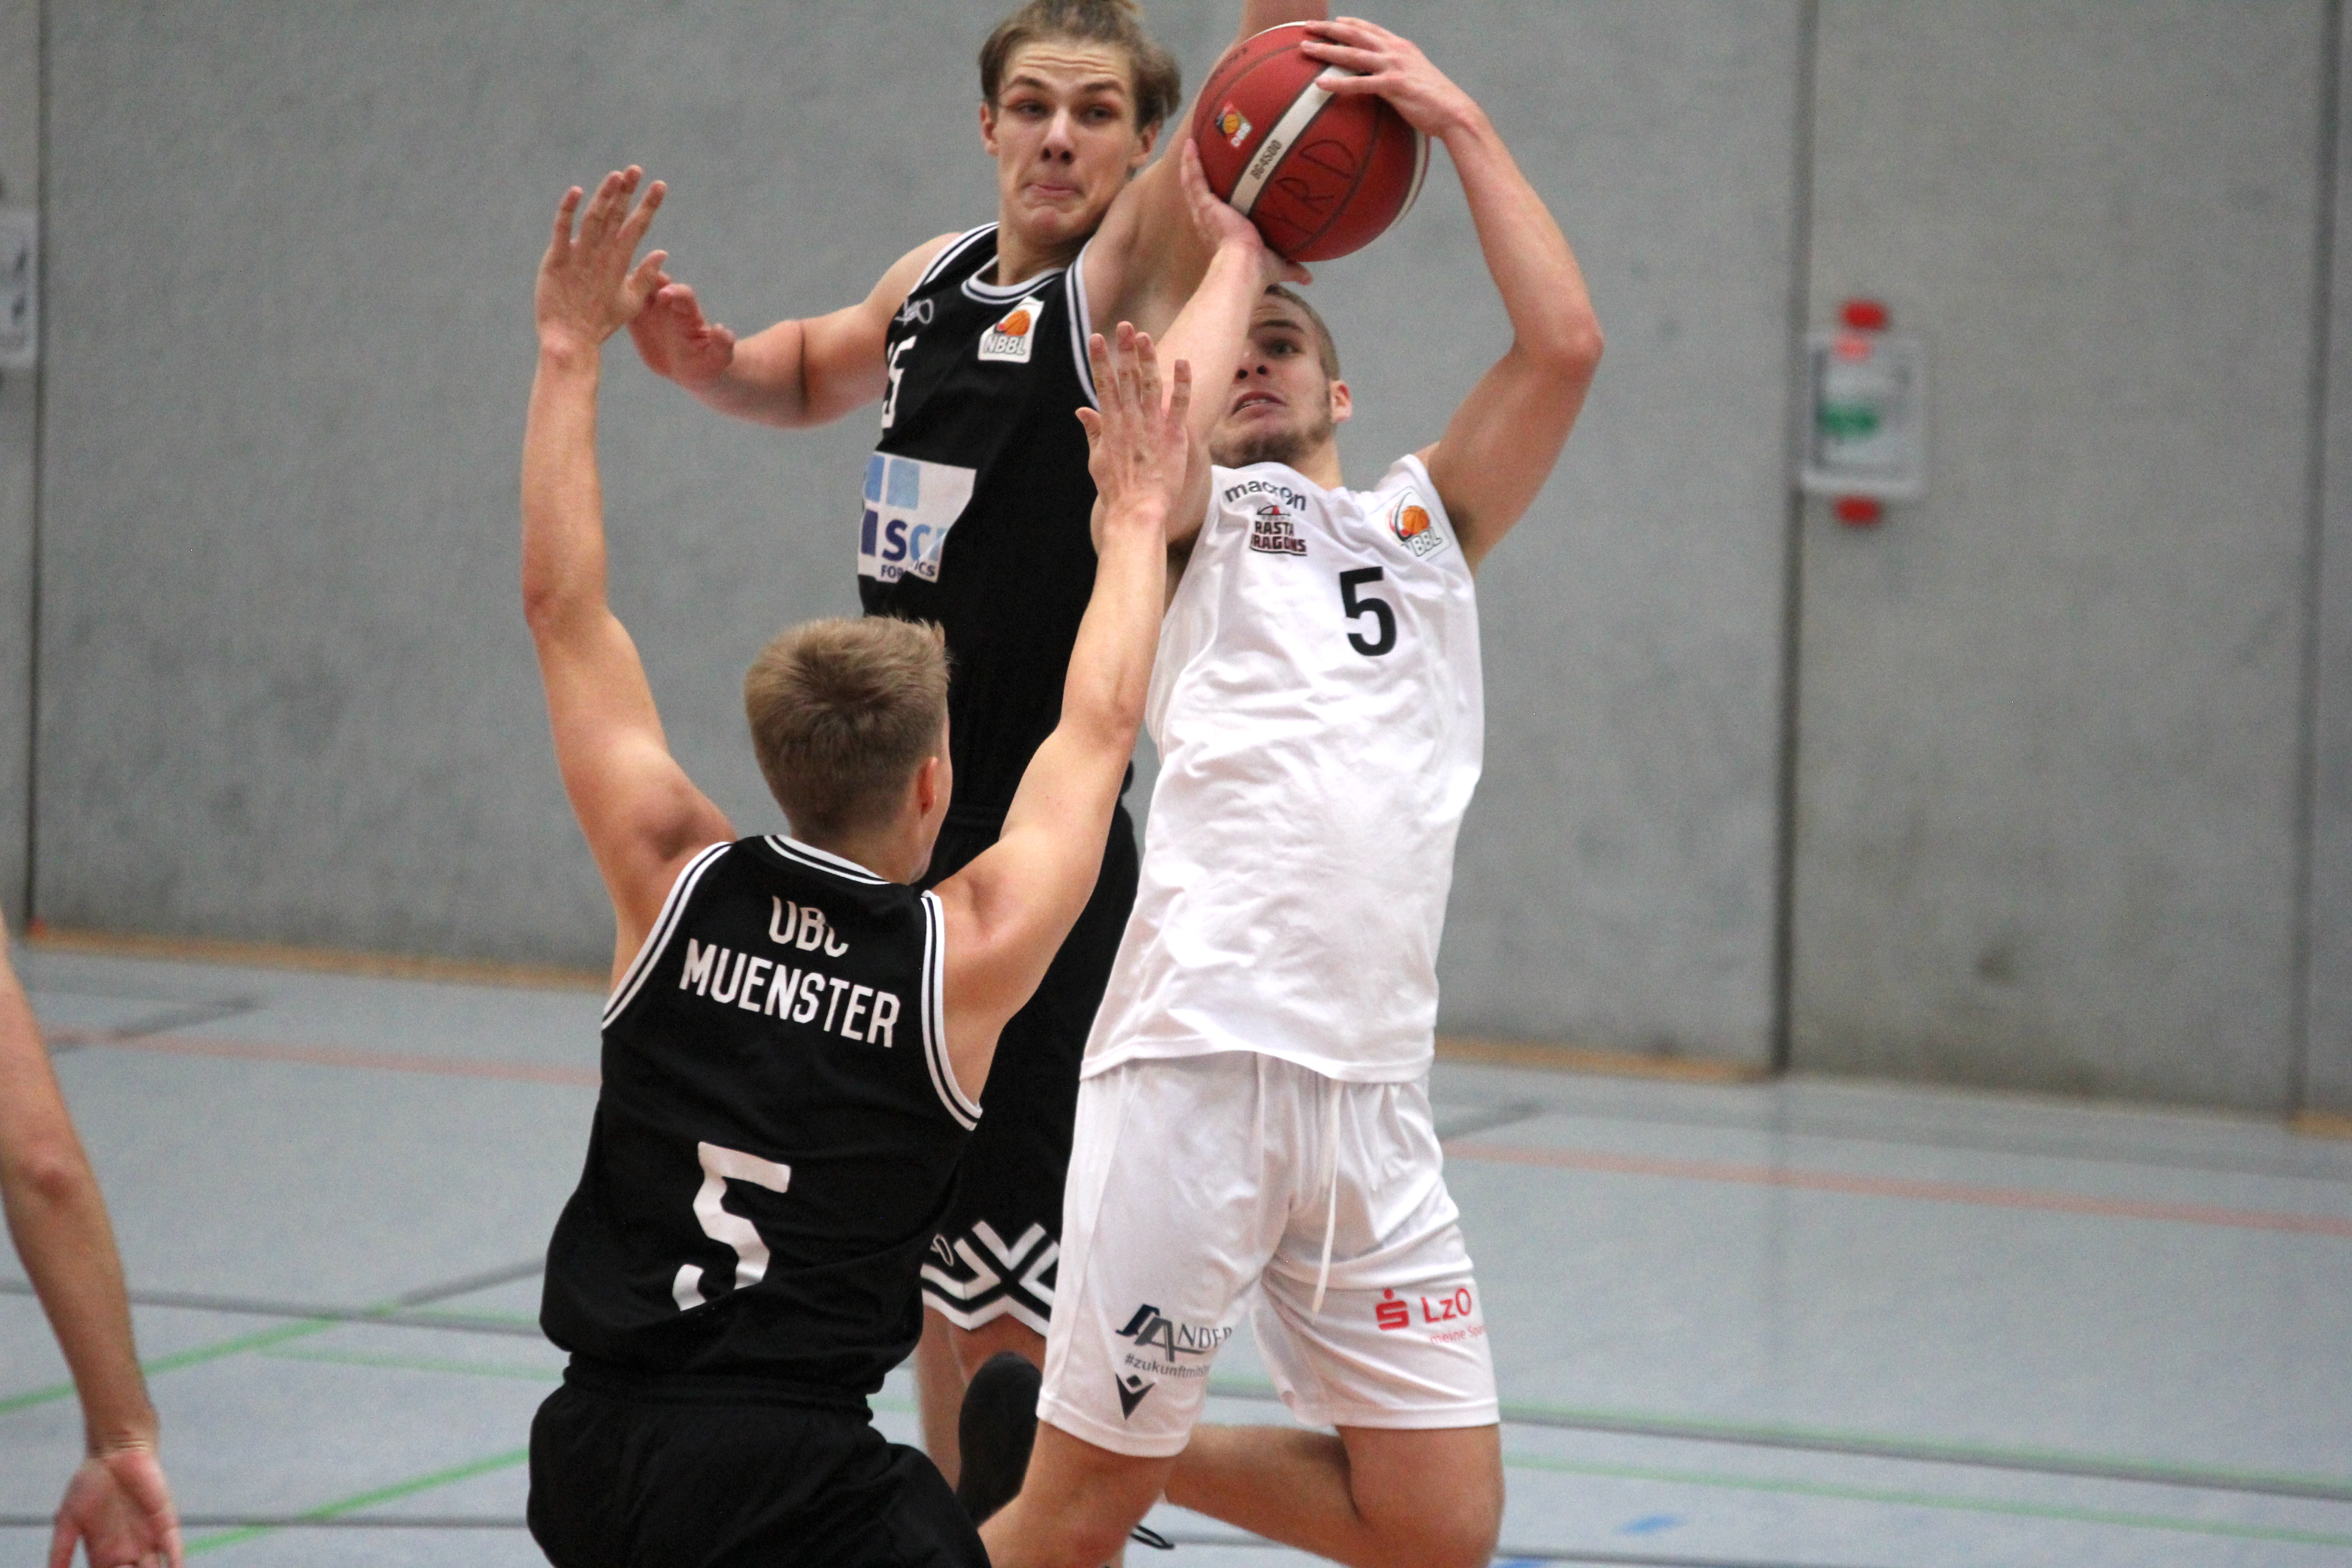 NBBL_20-21_YOUNG-RASTA-DRAGONS_Münster_Spieltag1_Torge-Buthmann_15